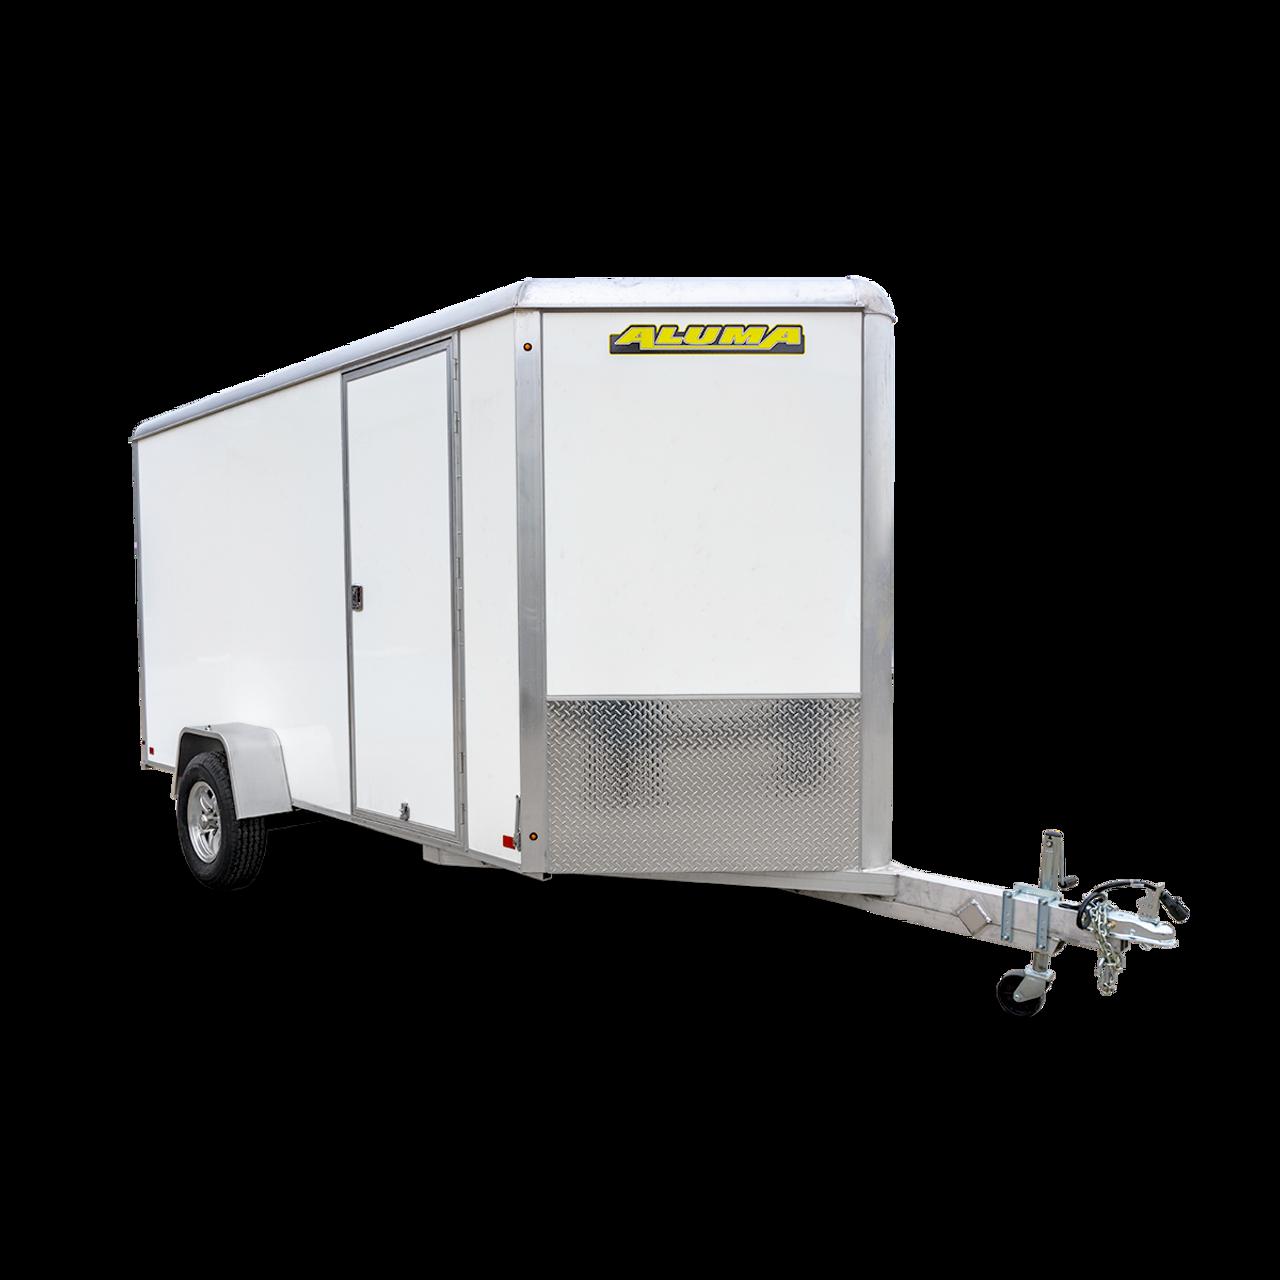 AL612SADRD --- 6' X 12' Enclosed Trailer with Ramp Door - Aluma